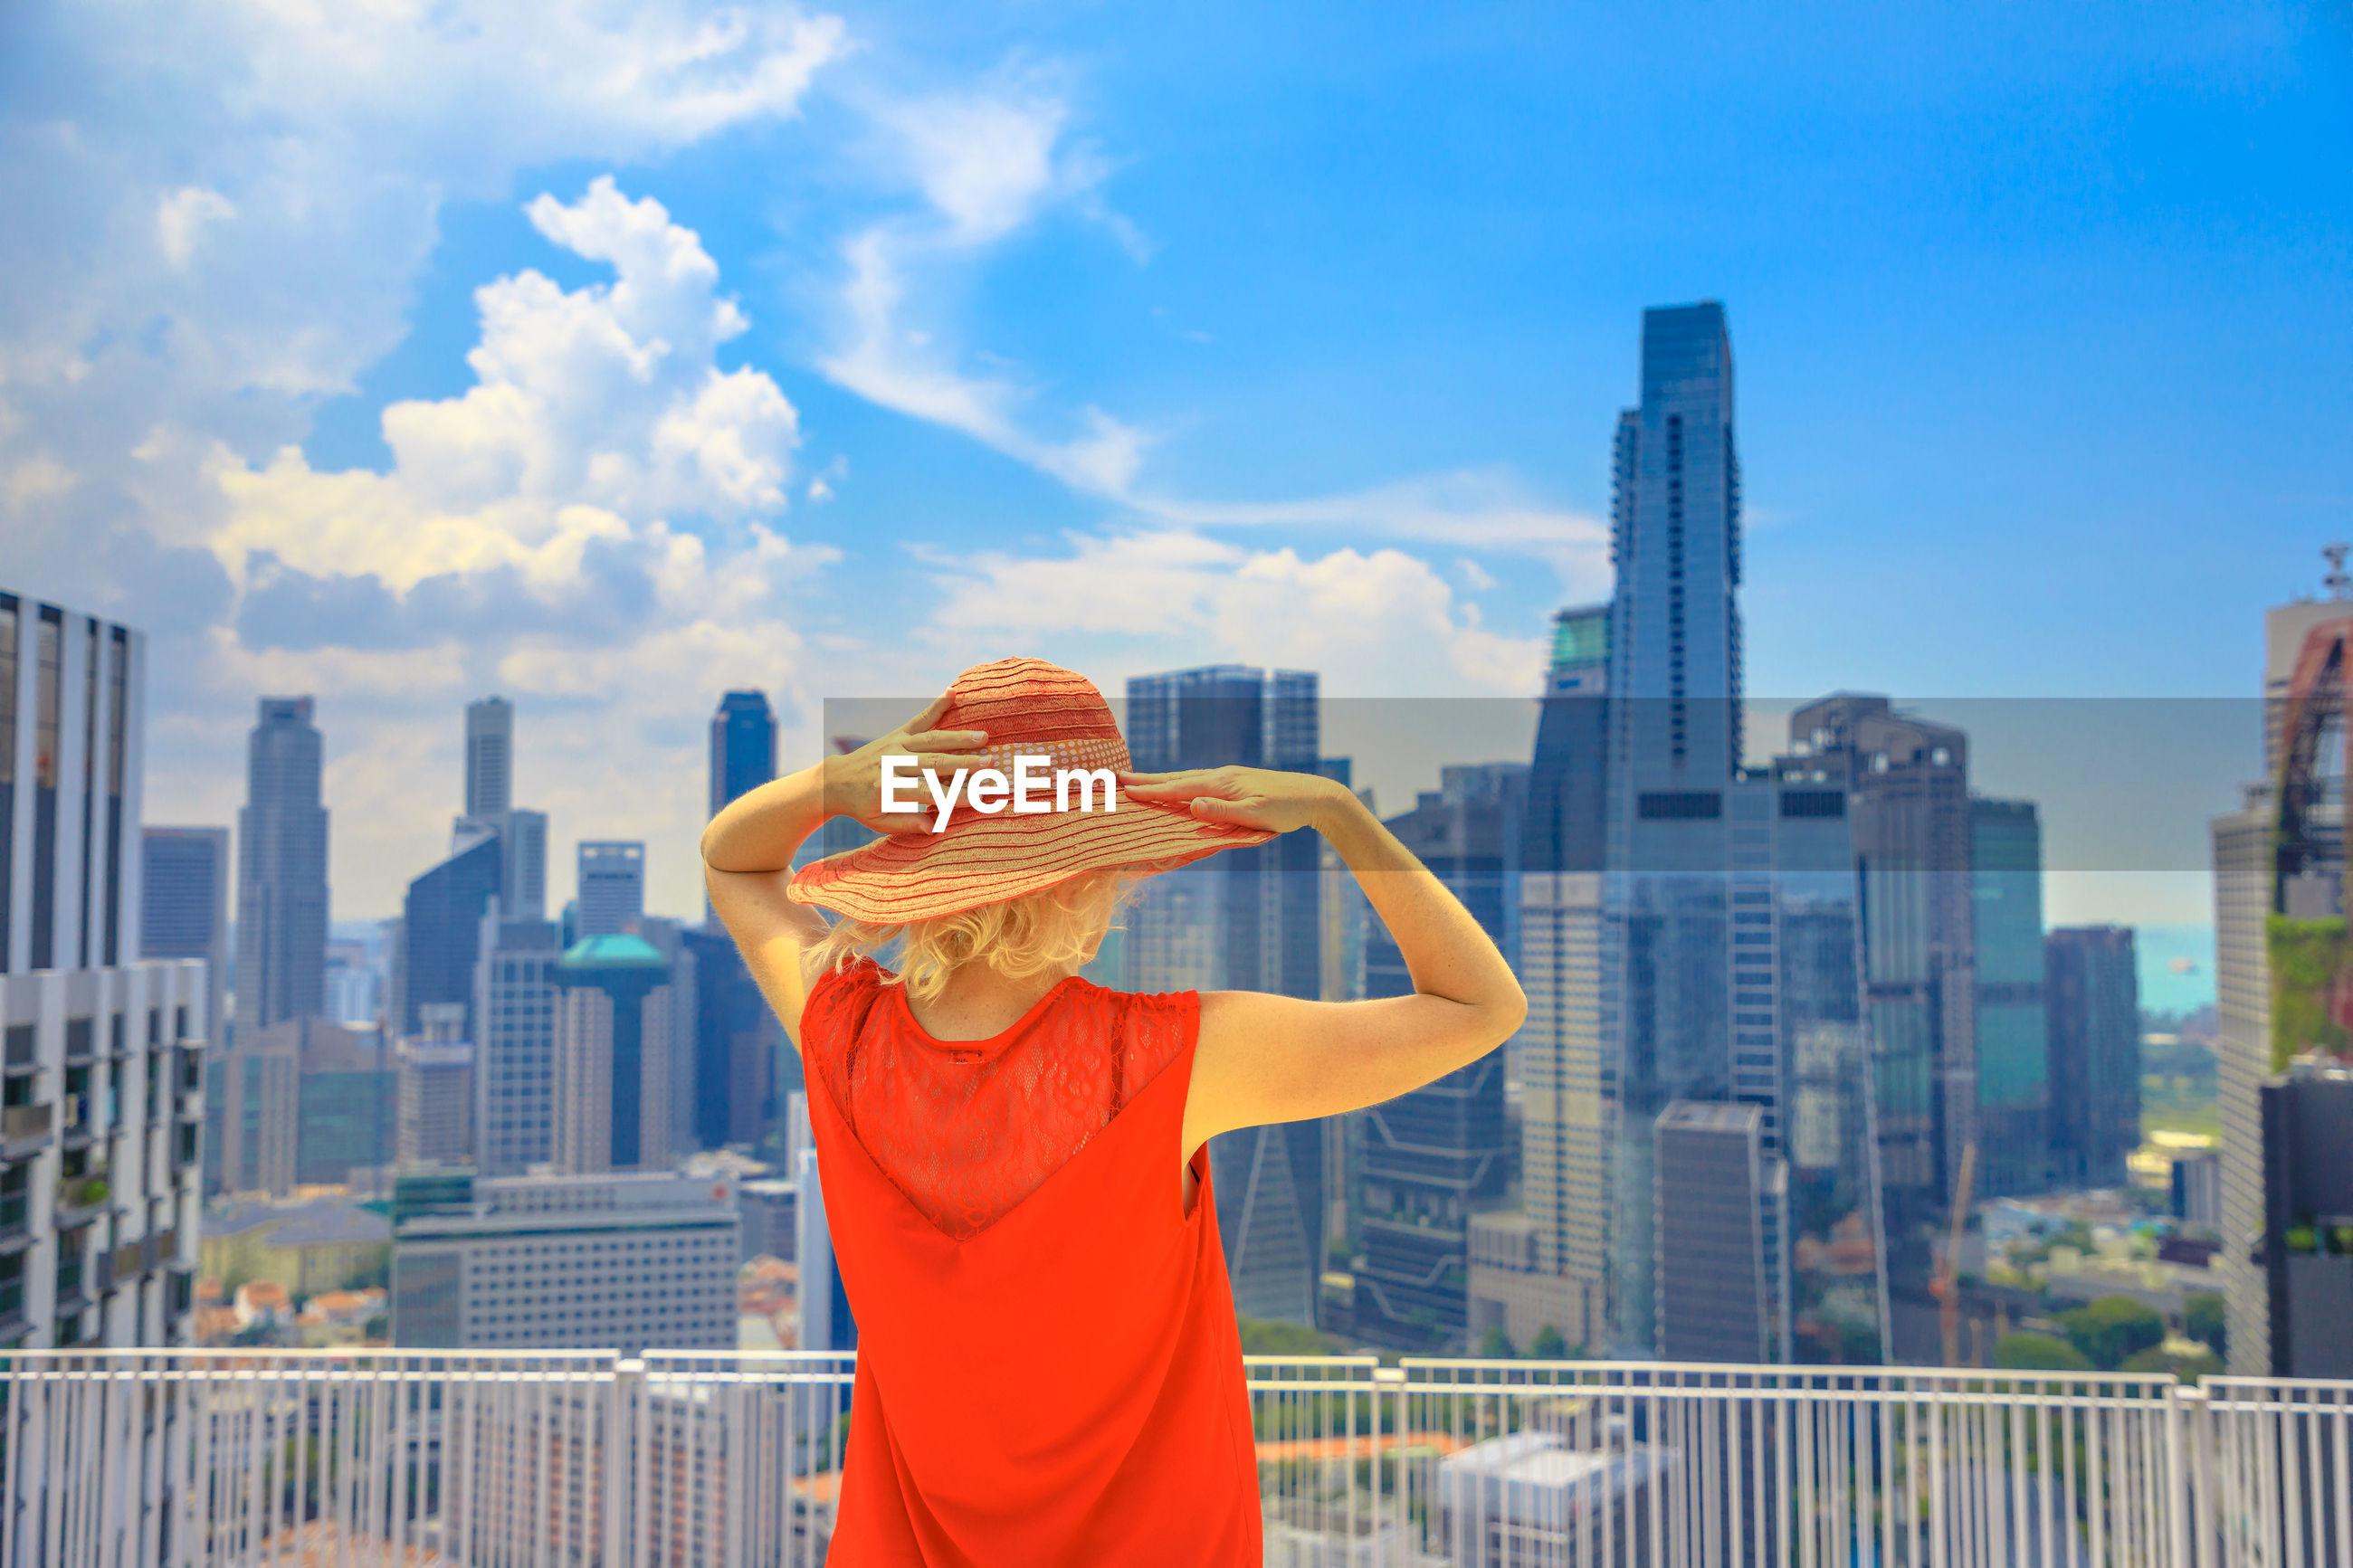 Woman standing against buildings in city